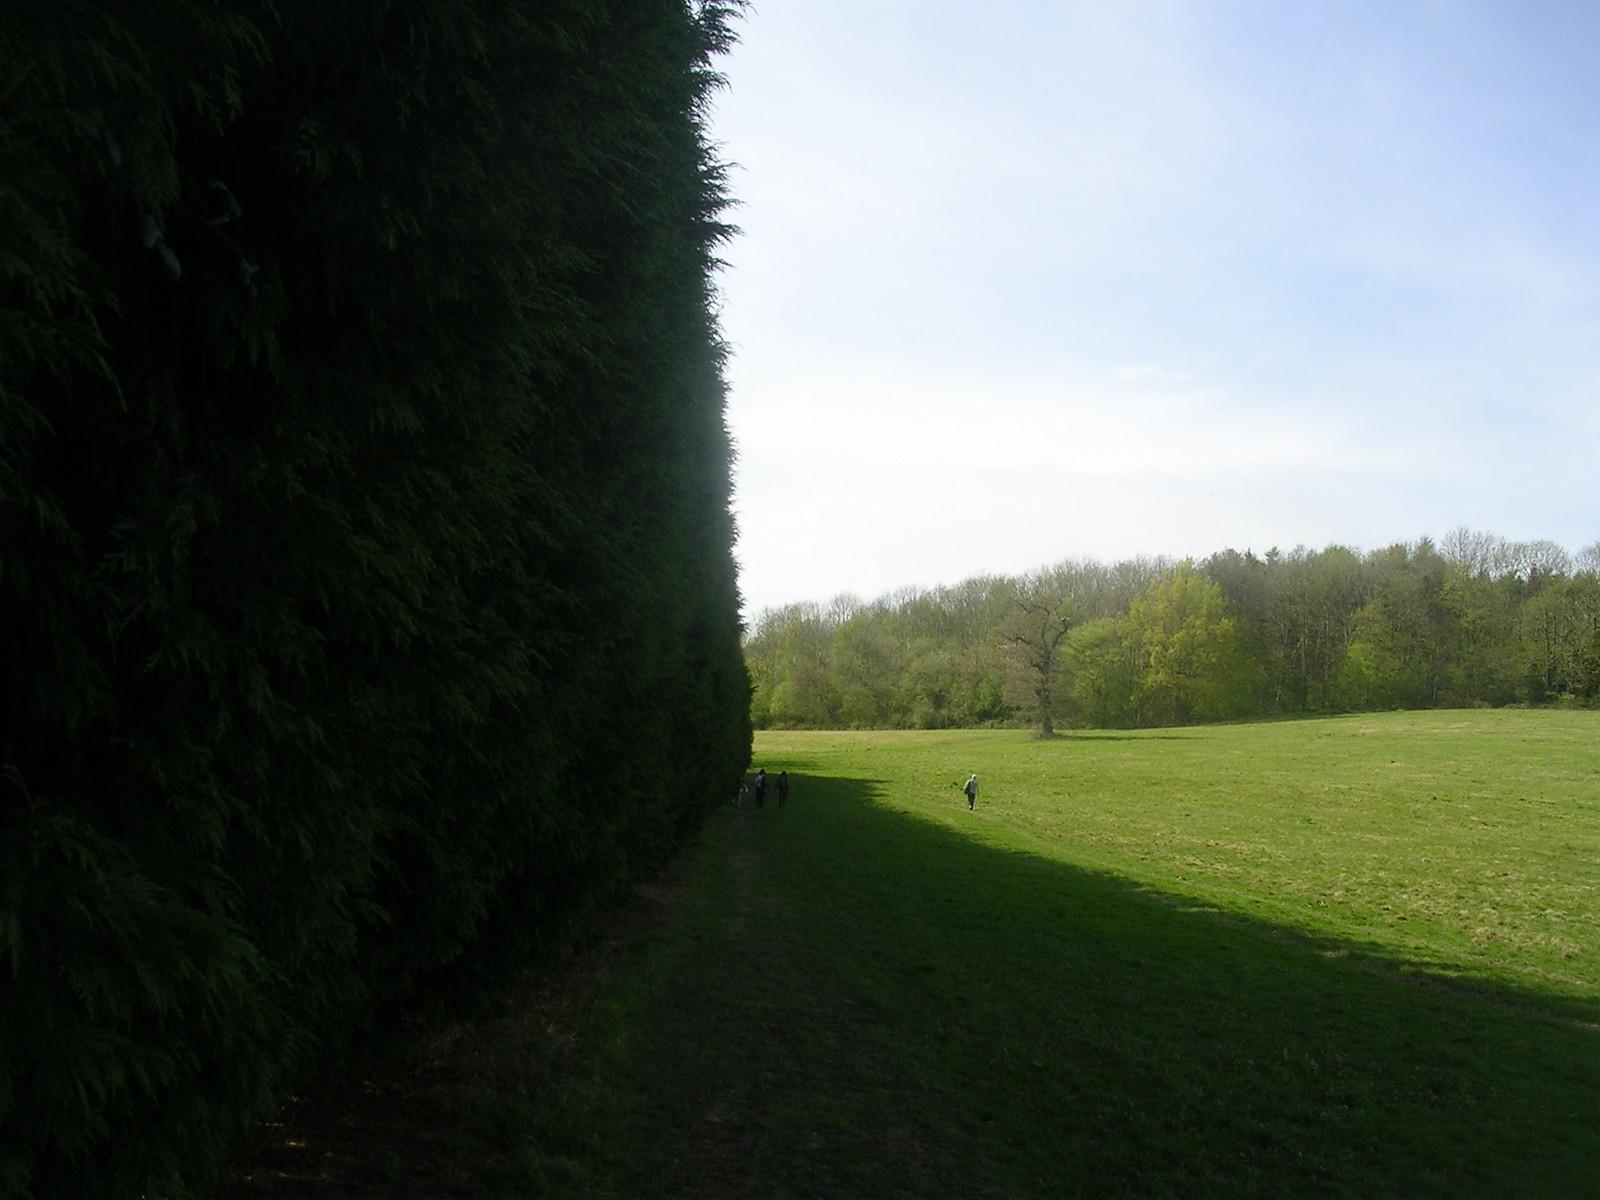 High hedge Yalding to Sevenoaks